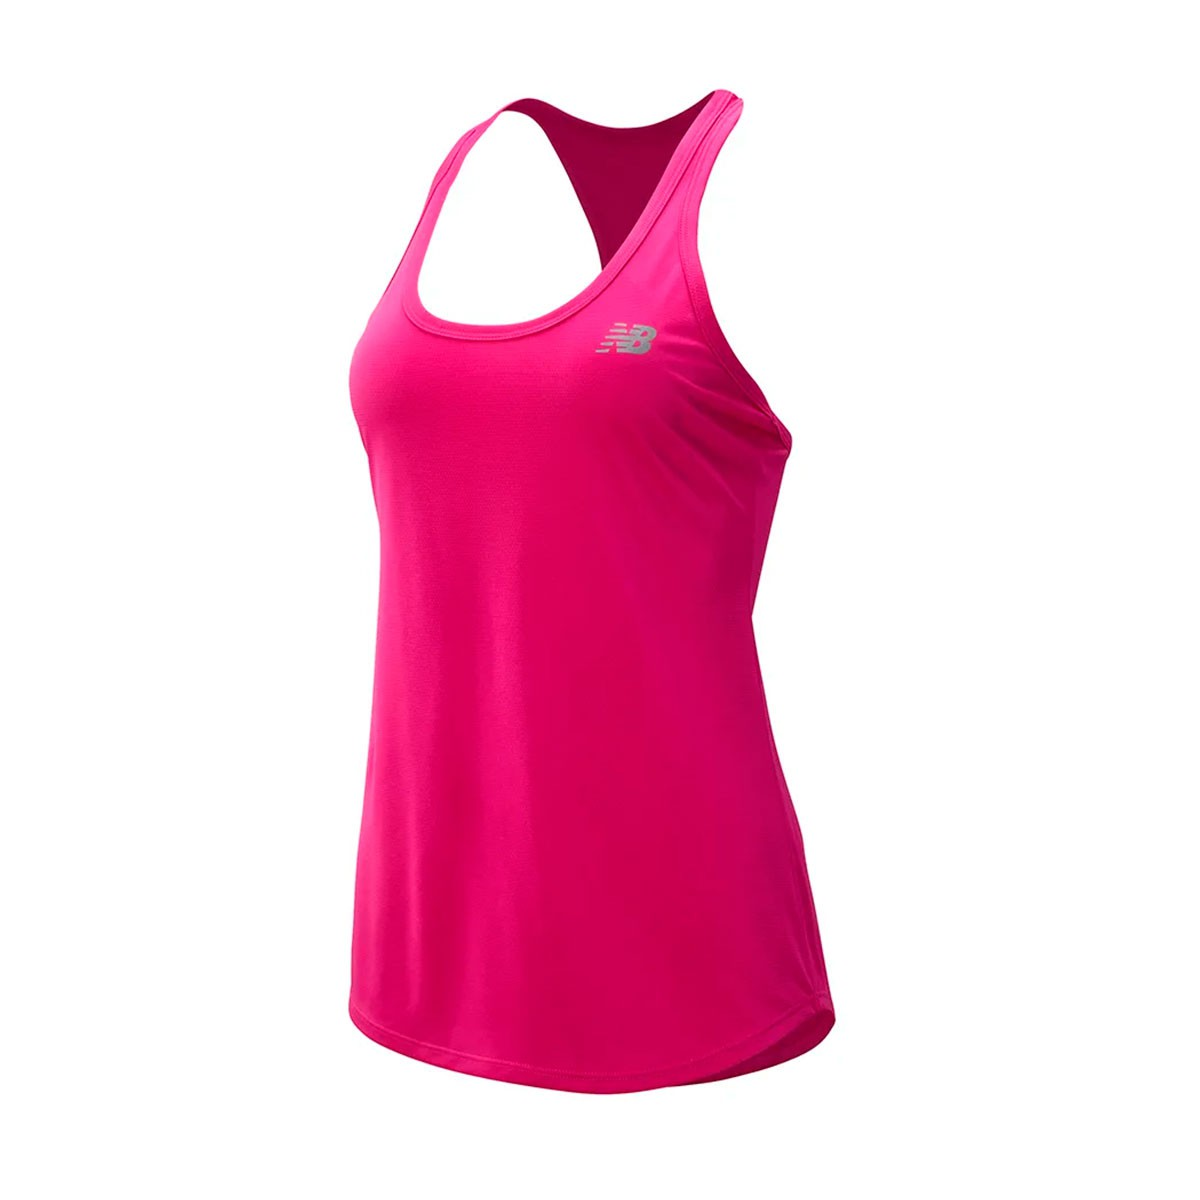 Camiseta Regata New Balance Accelerate v2 Feminino Rosa